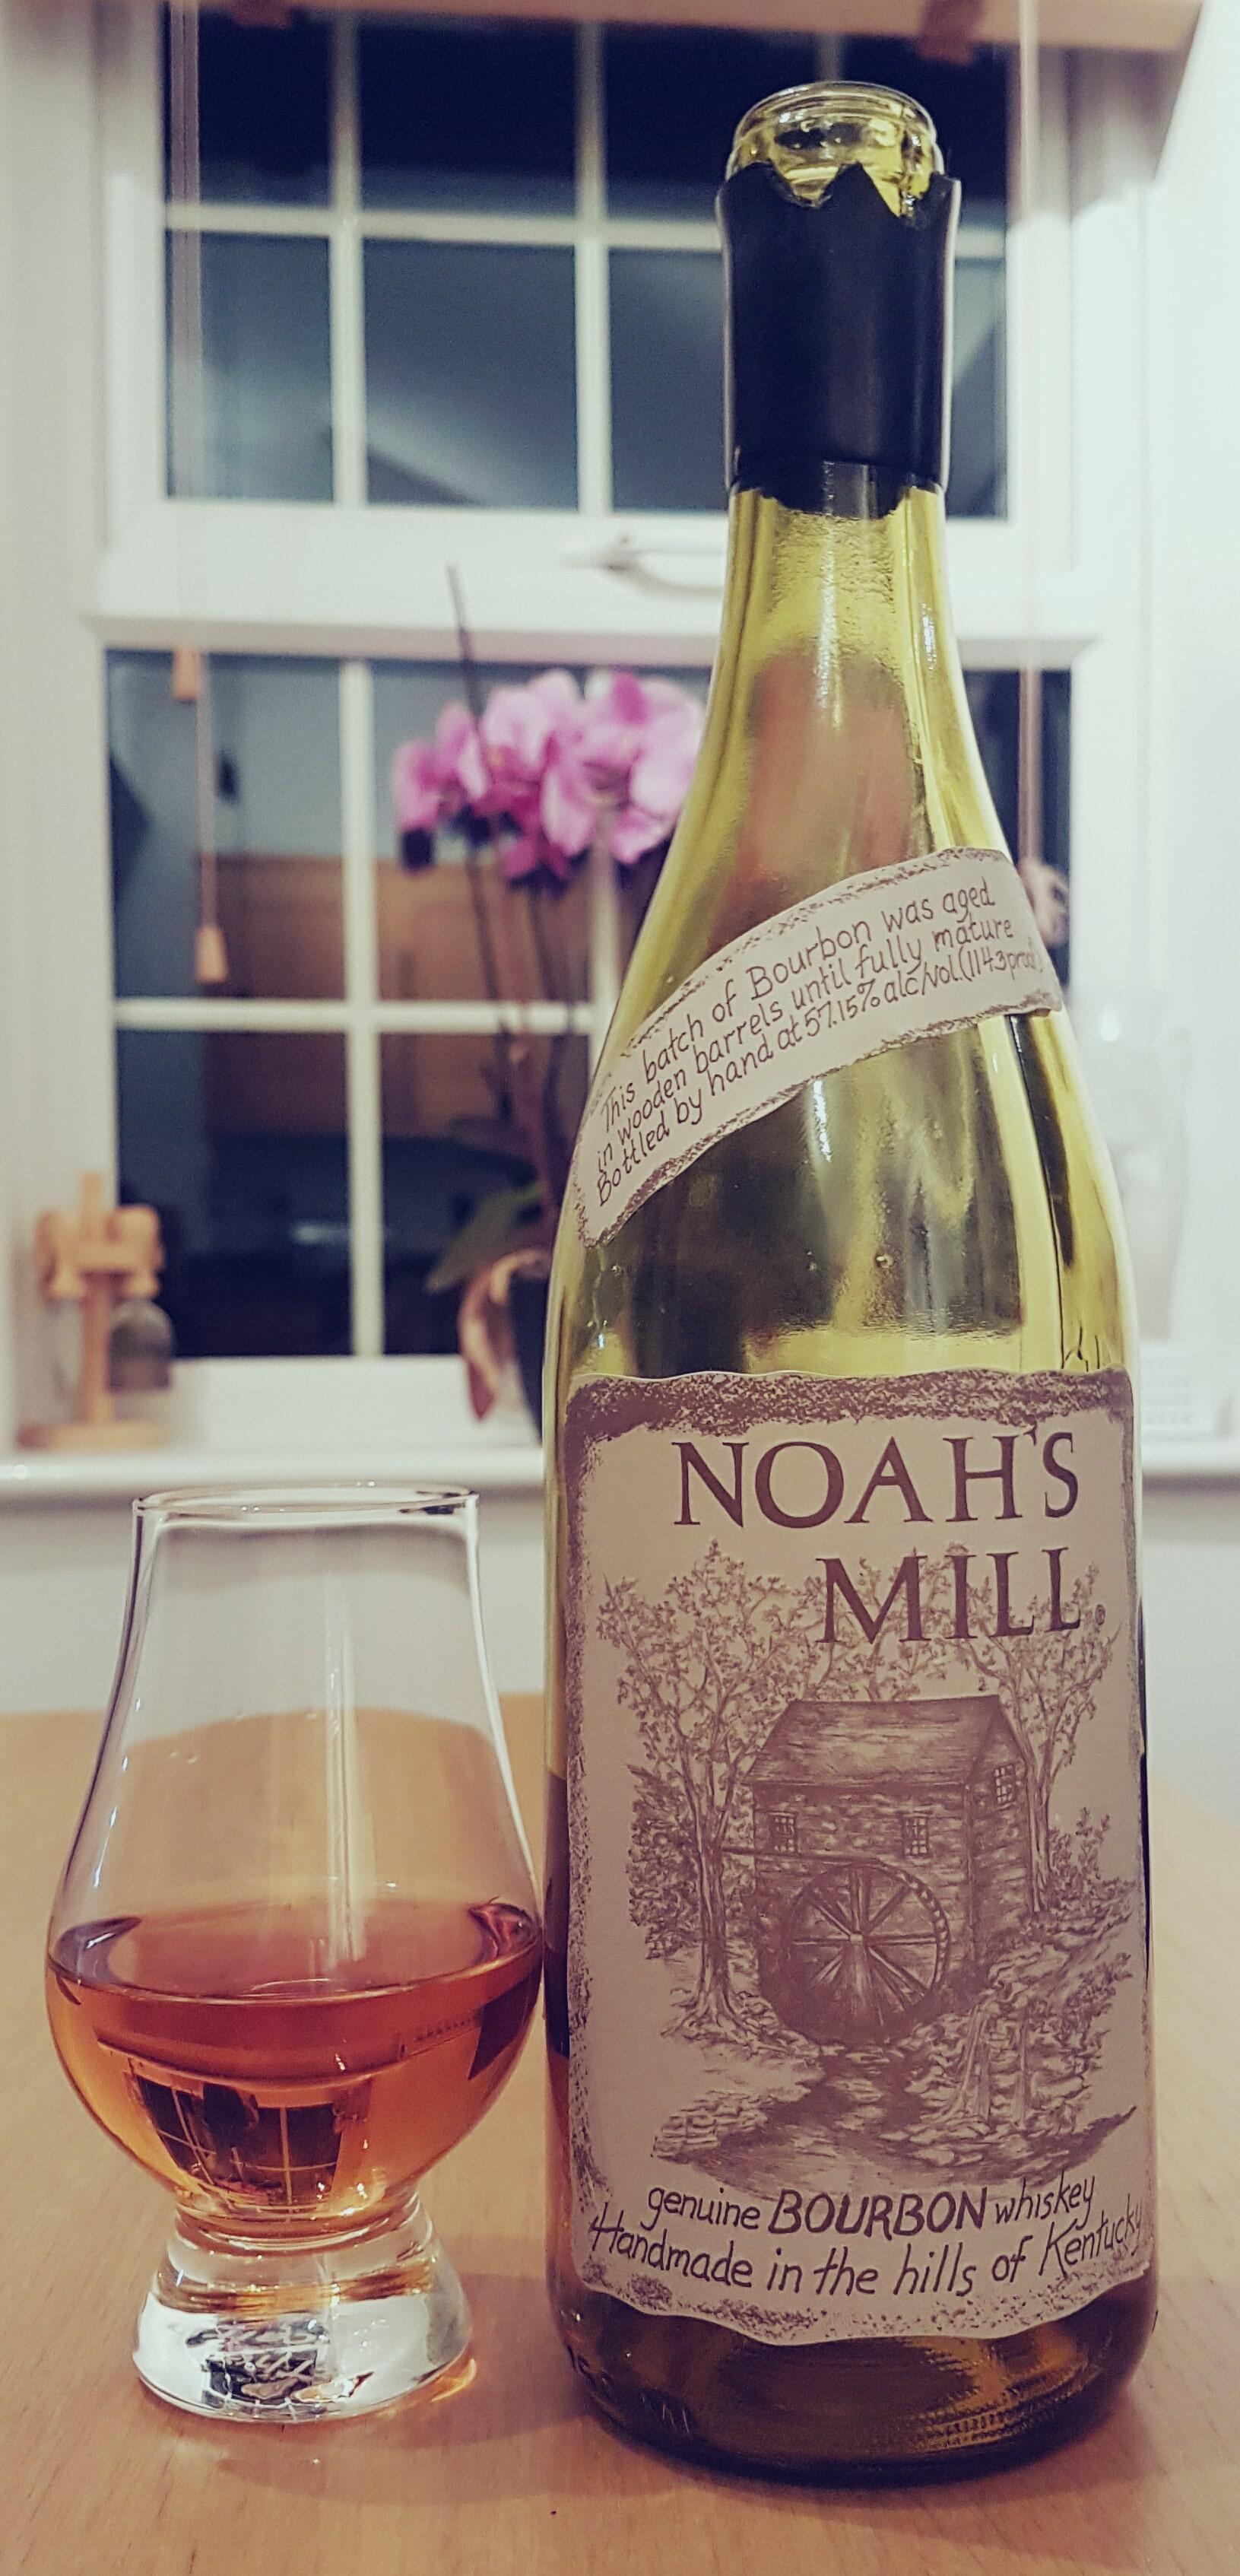 Ah Noah's Mill - a slightly more interesting bourbon